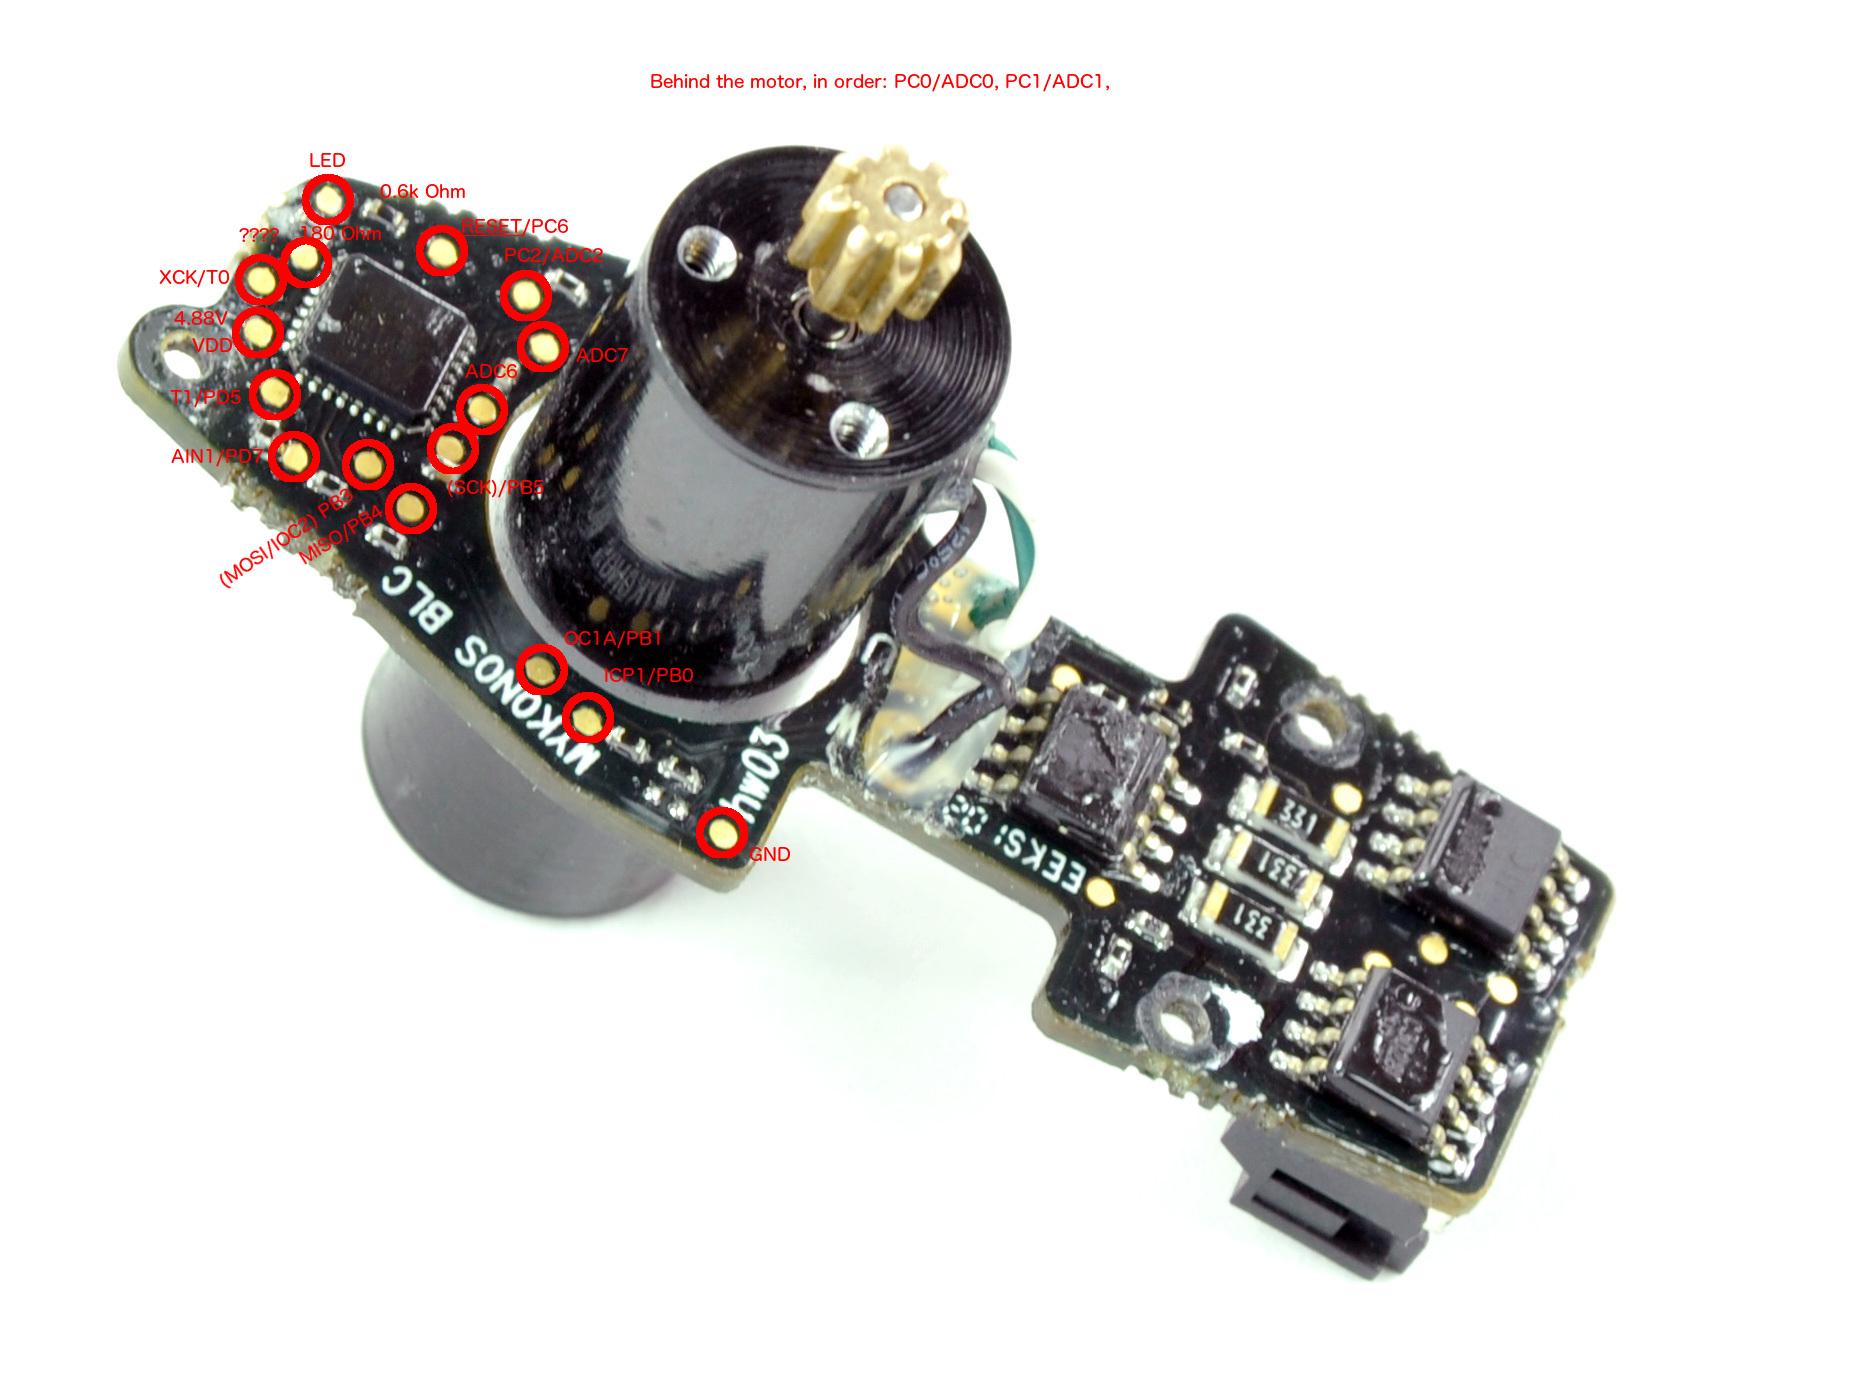 Drone motor pinout